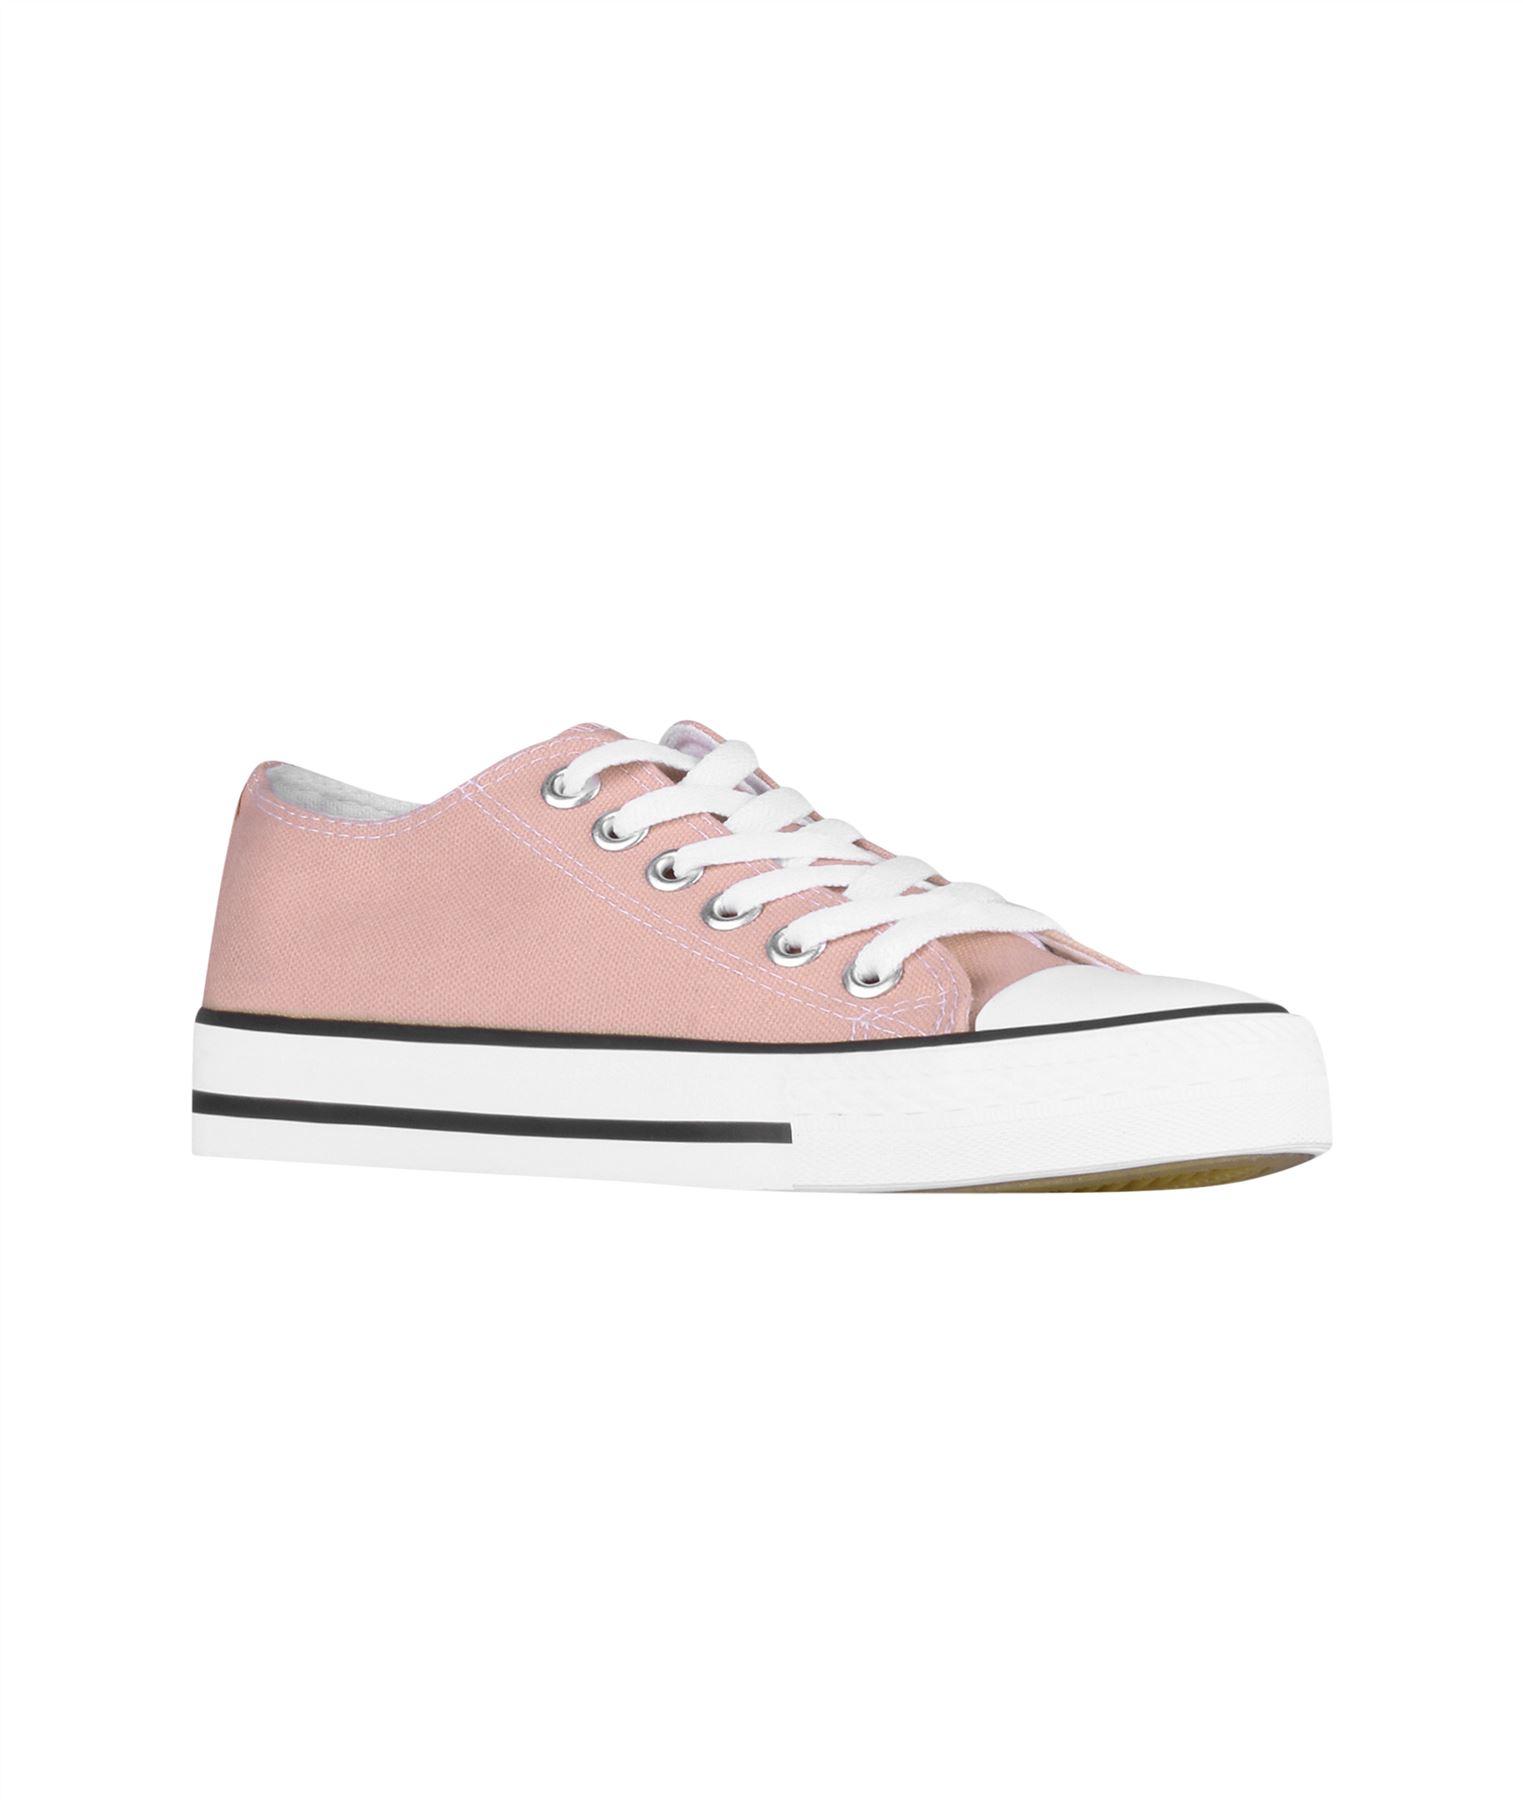 Zapatillas-Mujer-Casuales-Deportiva-Barata-Lona-Moda-Originales-Outlet-Tela-Moda miniatura 42